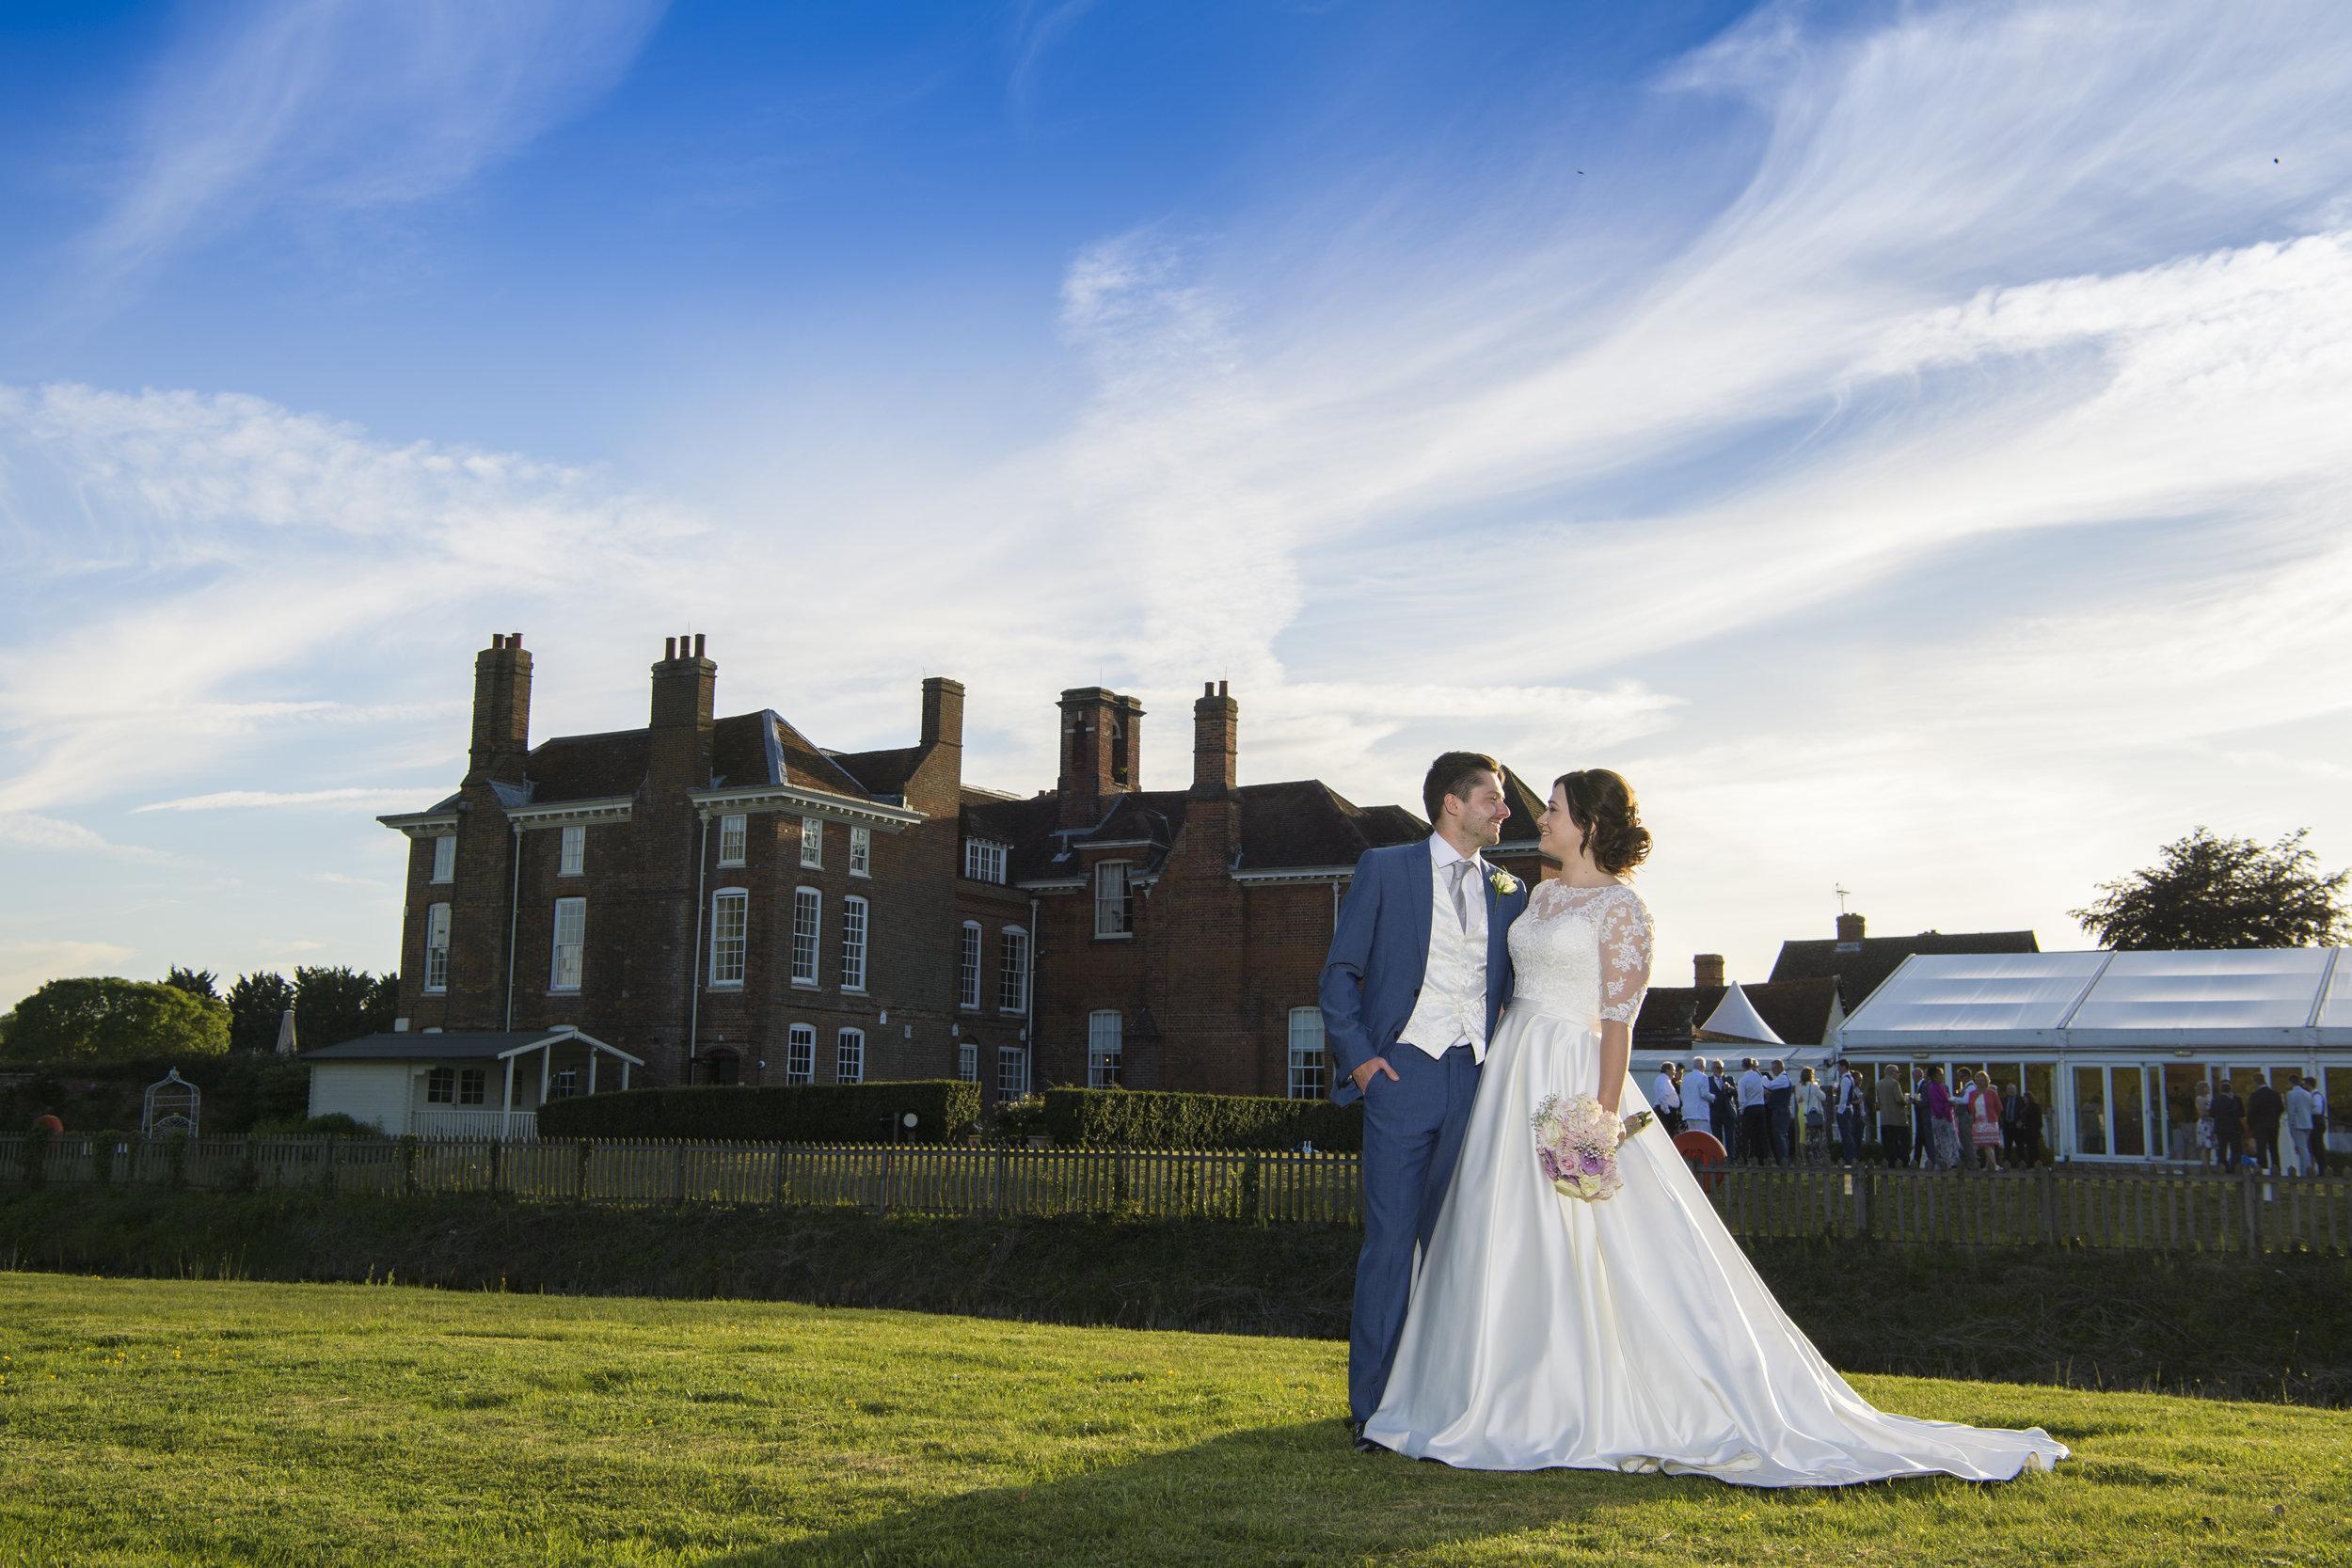 Weddings at Parklands, Quendon Hall